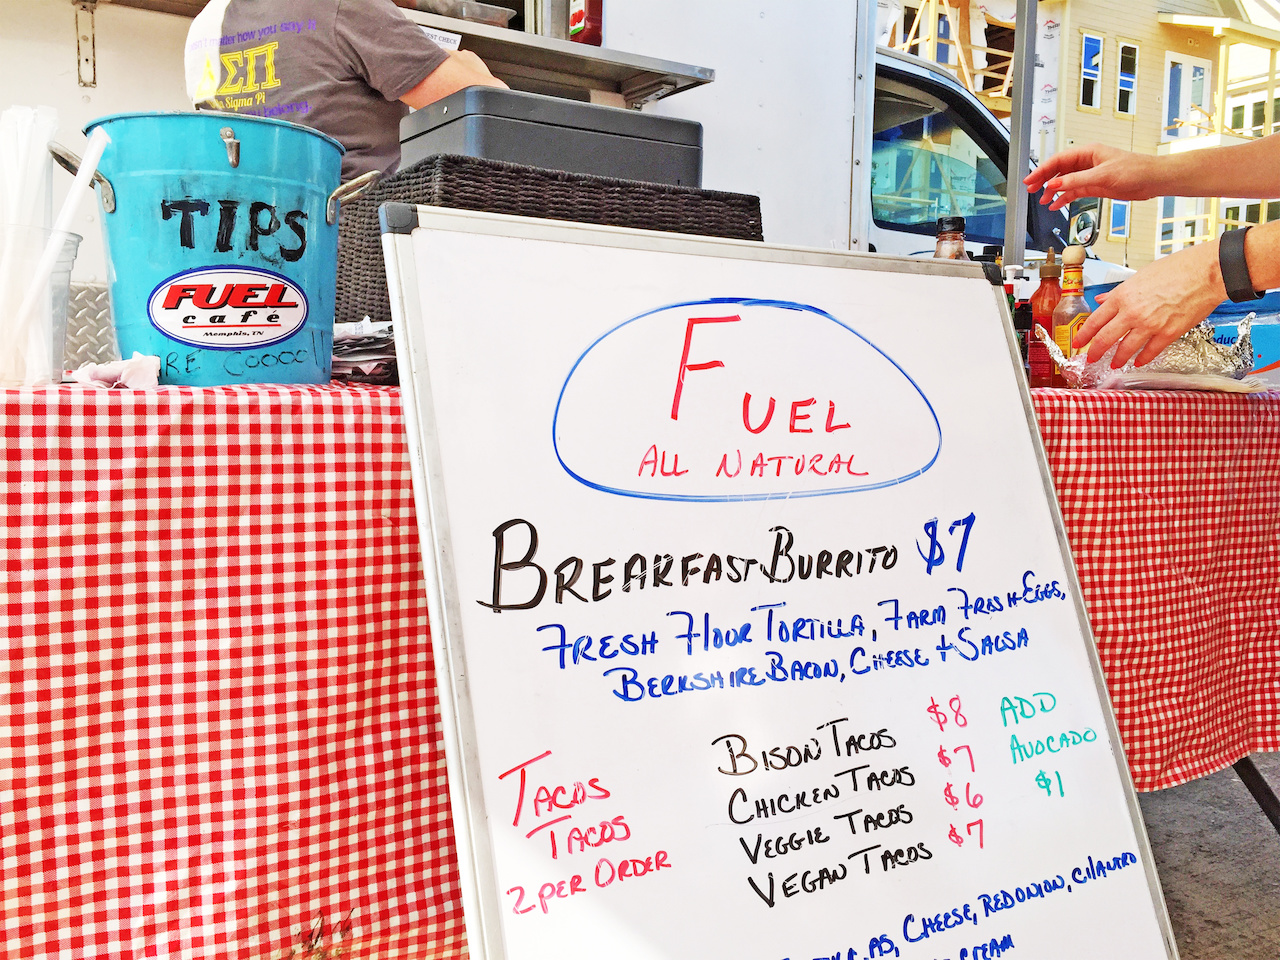 Fuel Breakfast Burrito, $7